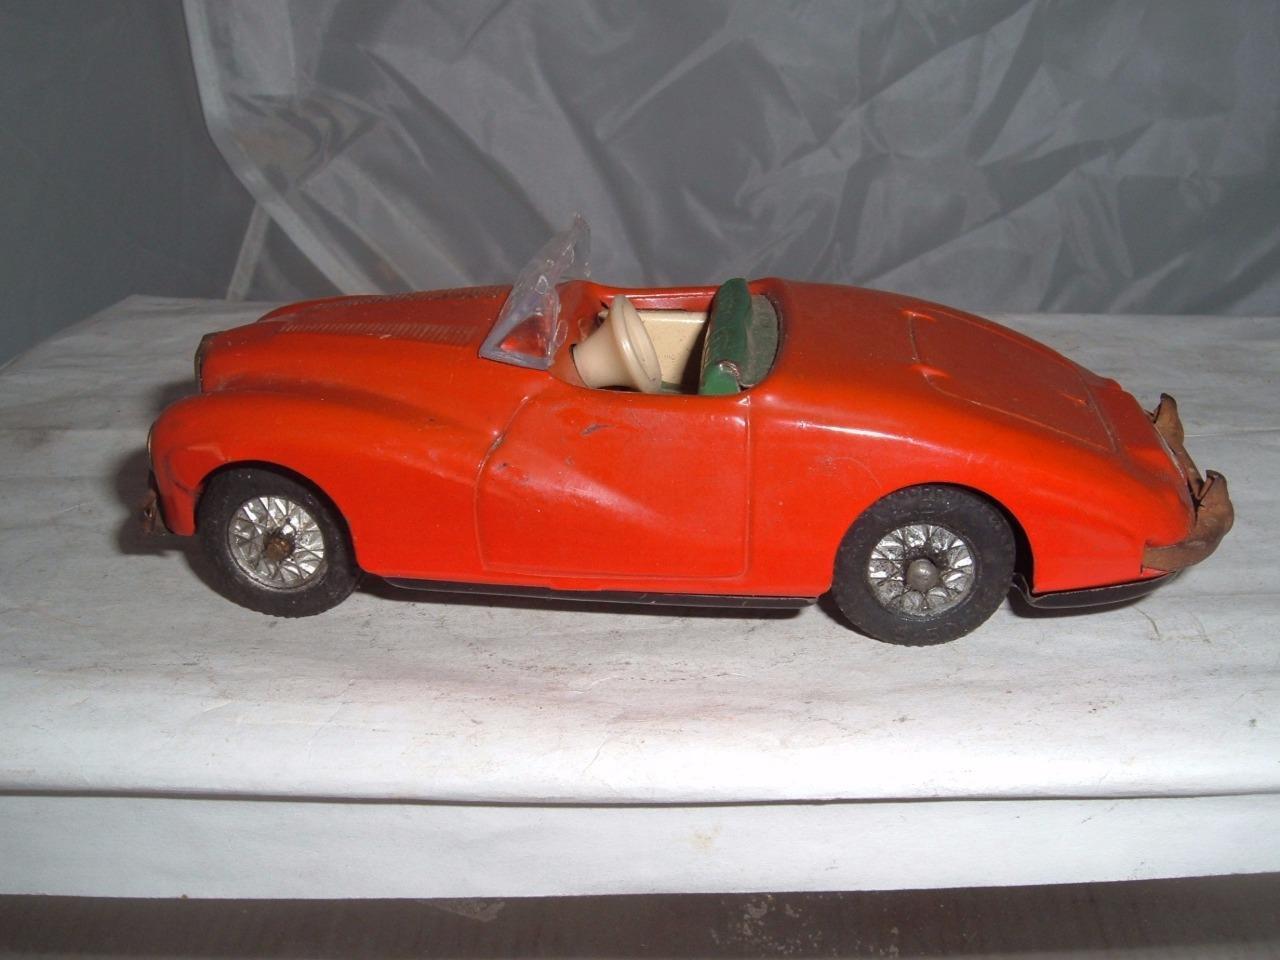 Startex sunbeam alpine 1950 ist jahrgang weißblech weißblech weißblech rot (arbeits -) neue windschutzscheibe 0f18c8